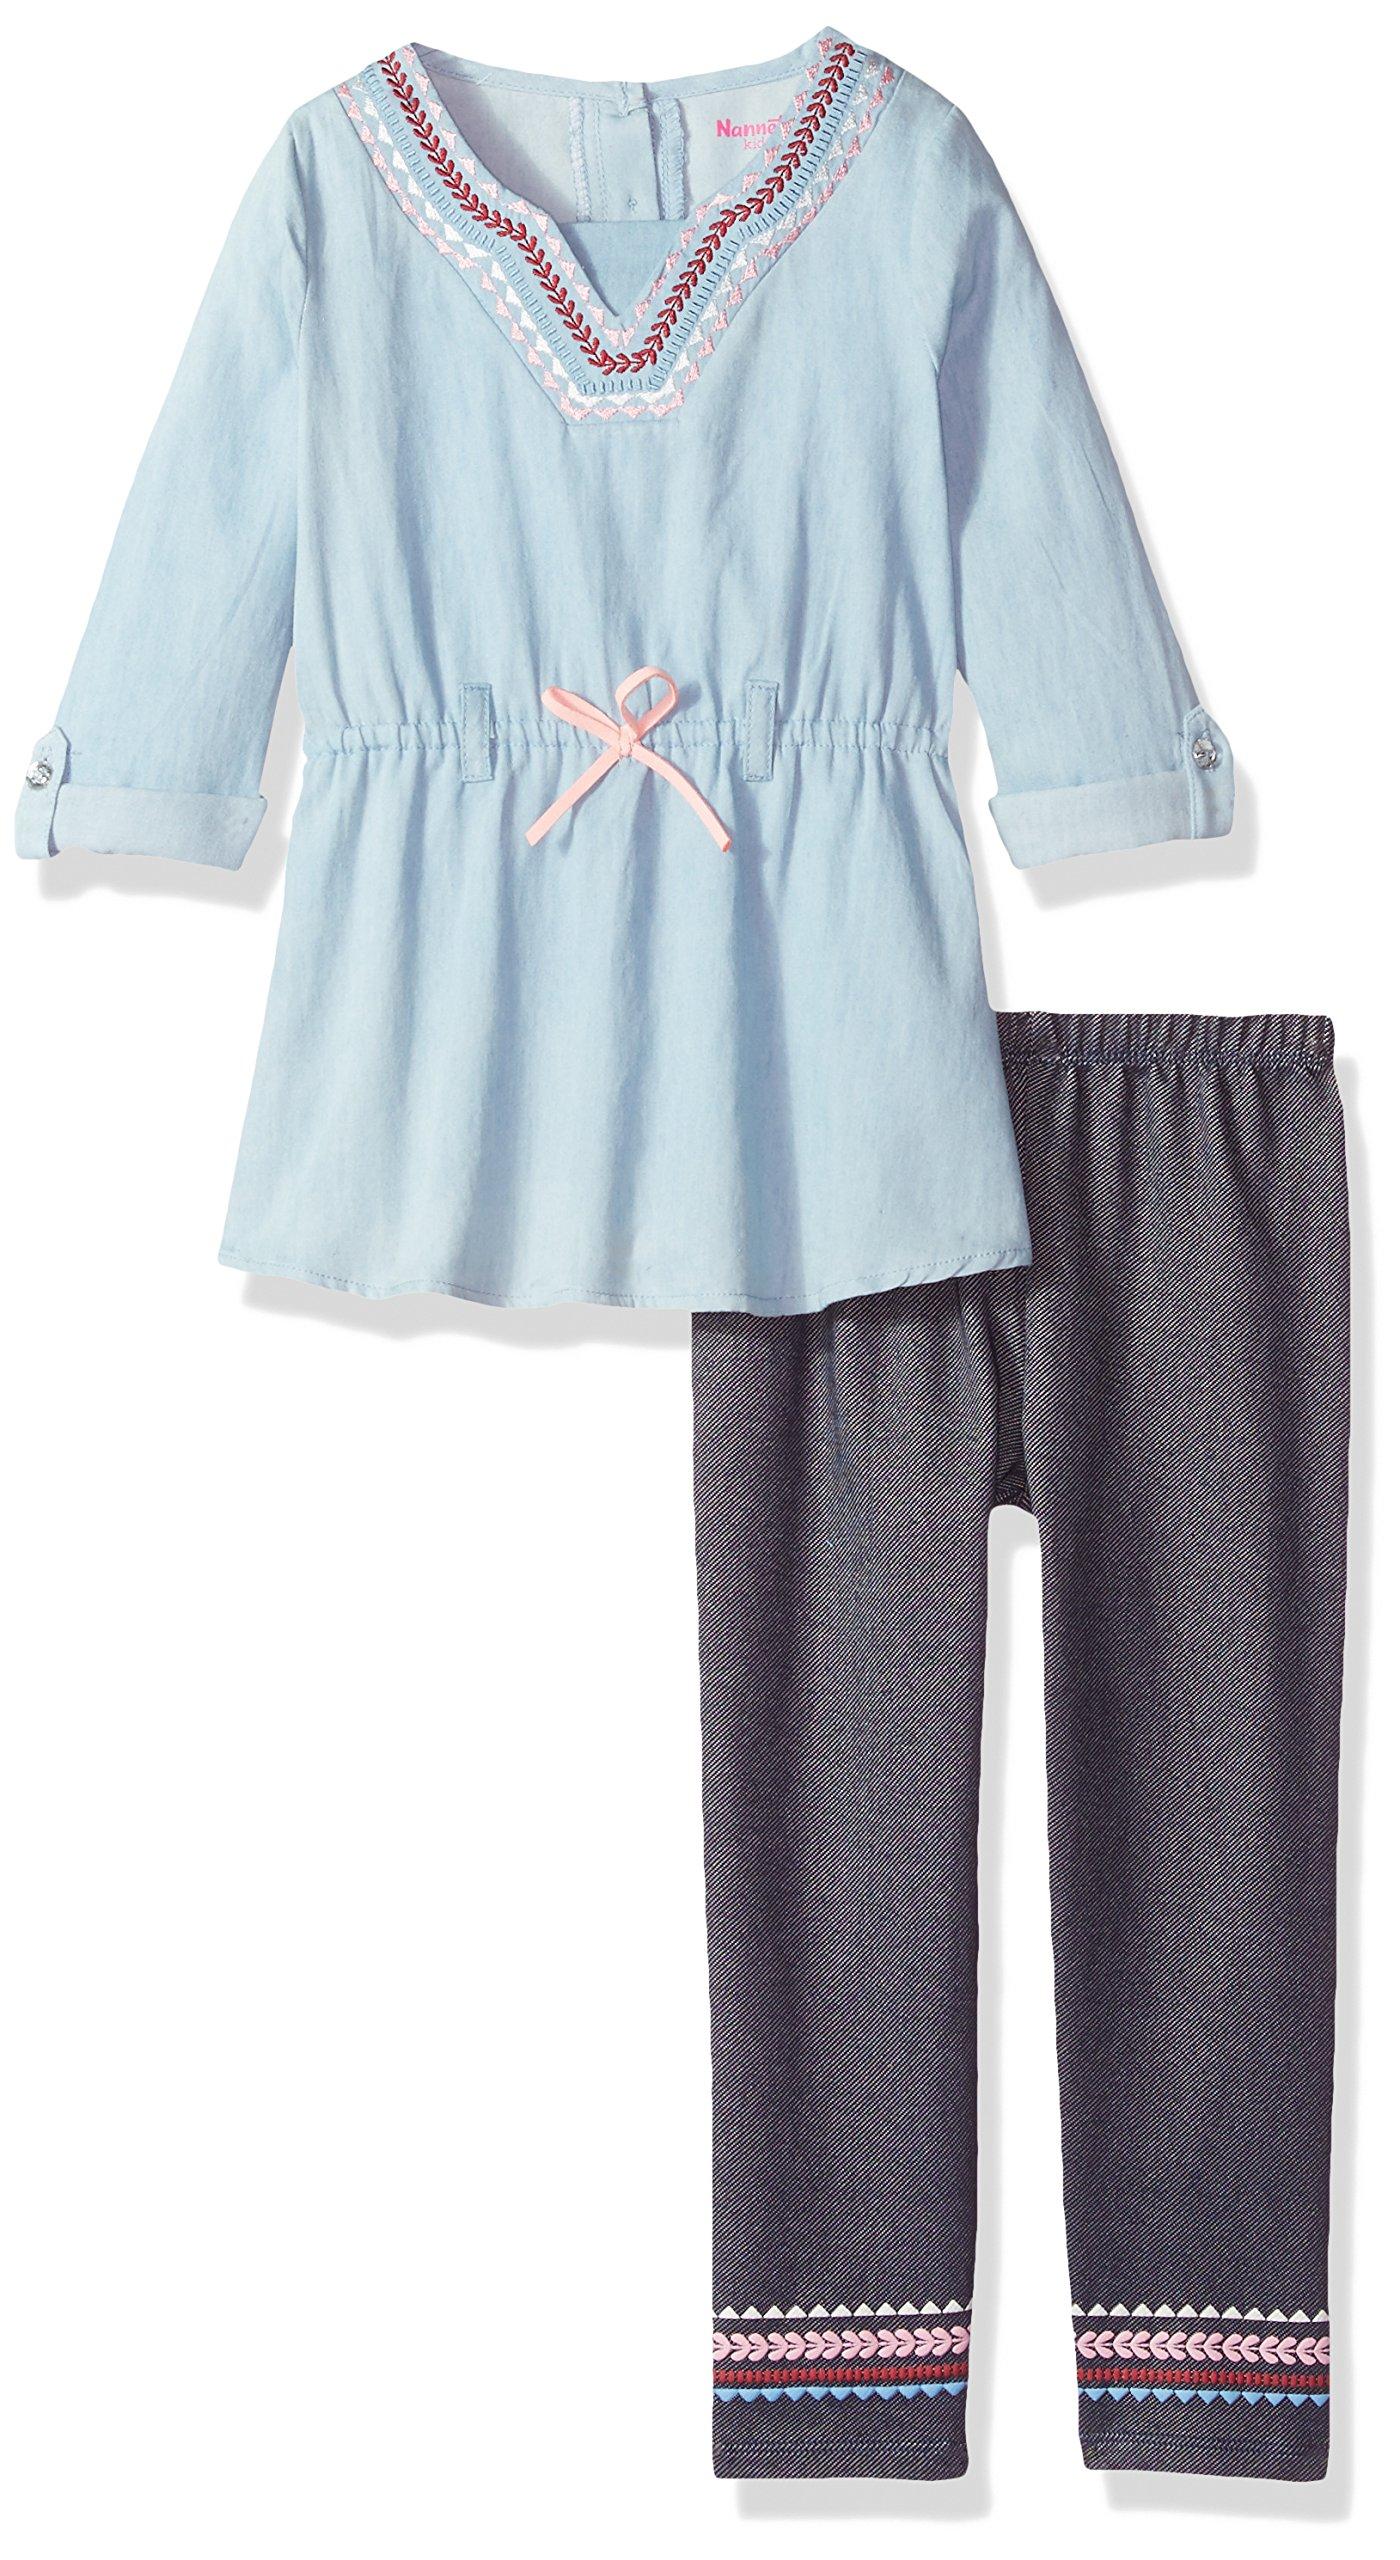 Nannette Little Girls' 2 Piece Chambray Top with Legging Set, Light Blue, 4